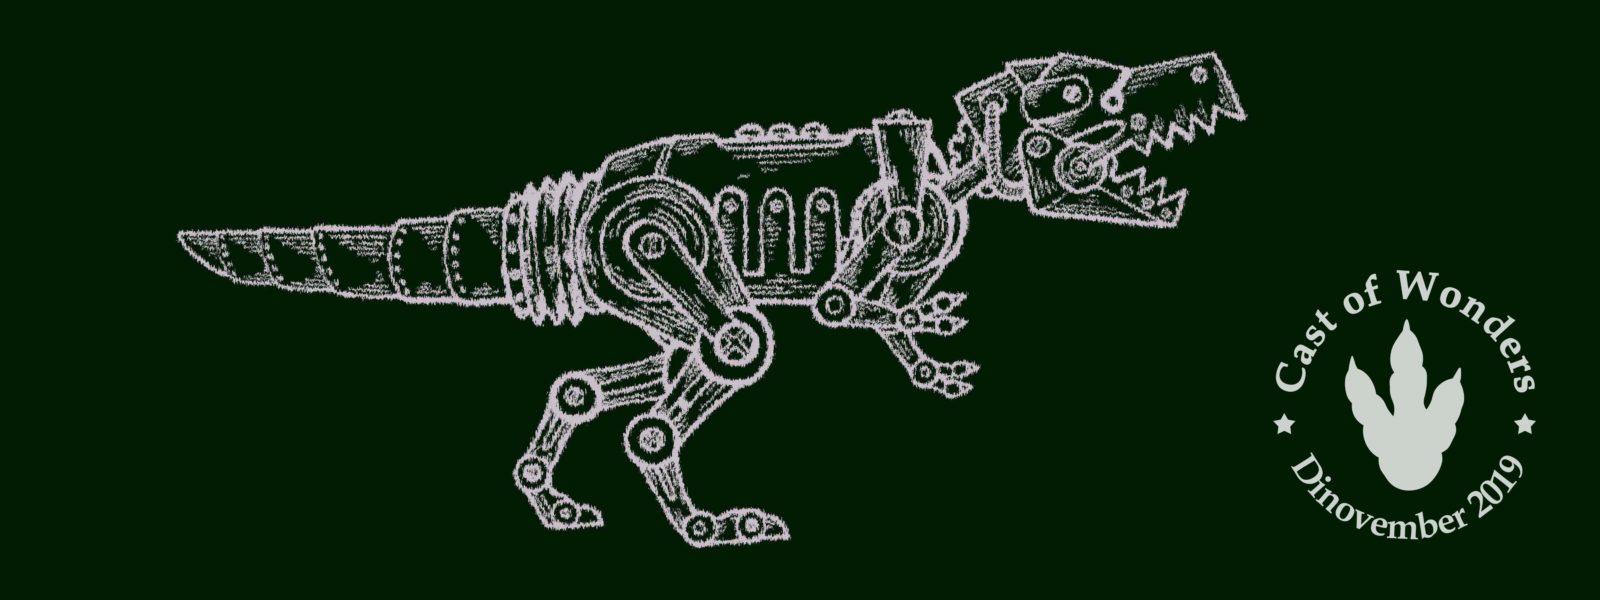 Image of a robotic dinosaur